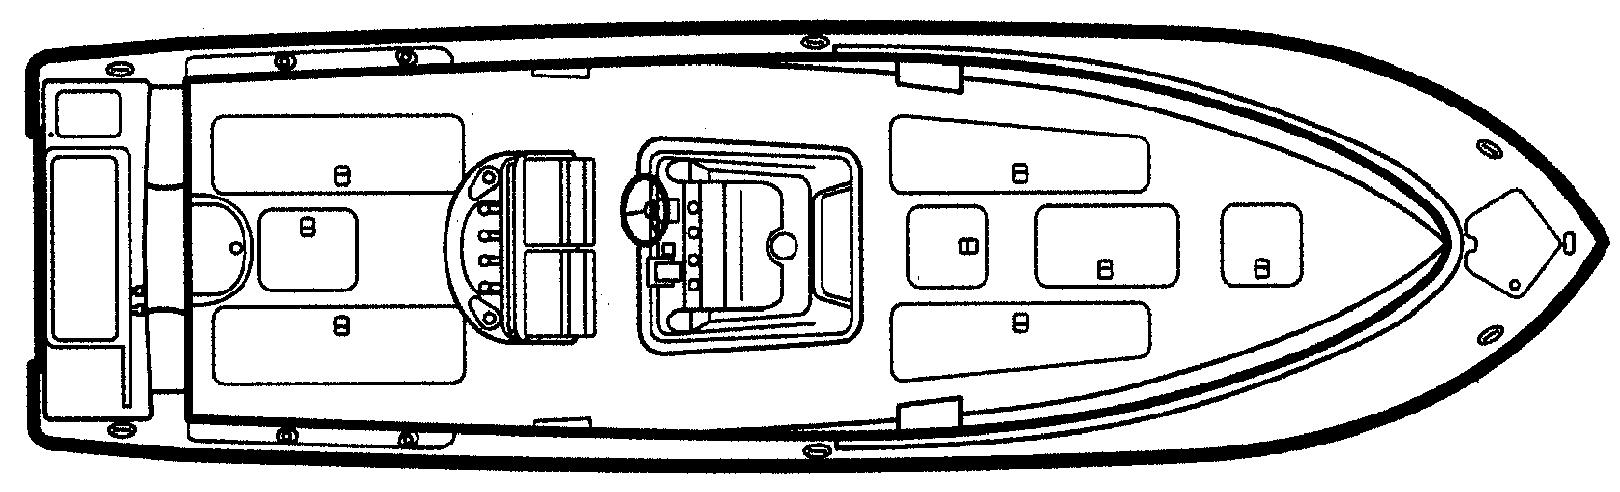 3480 Center Console; C 340 Floor Plan 1